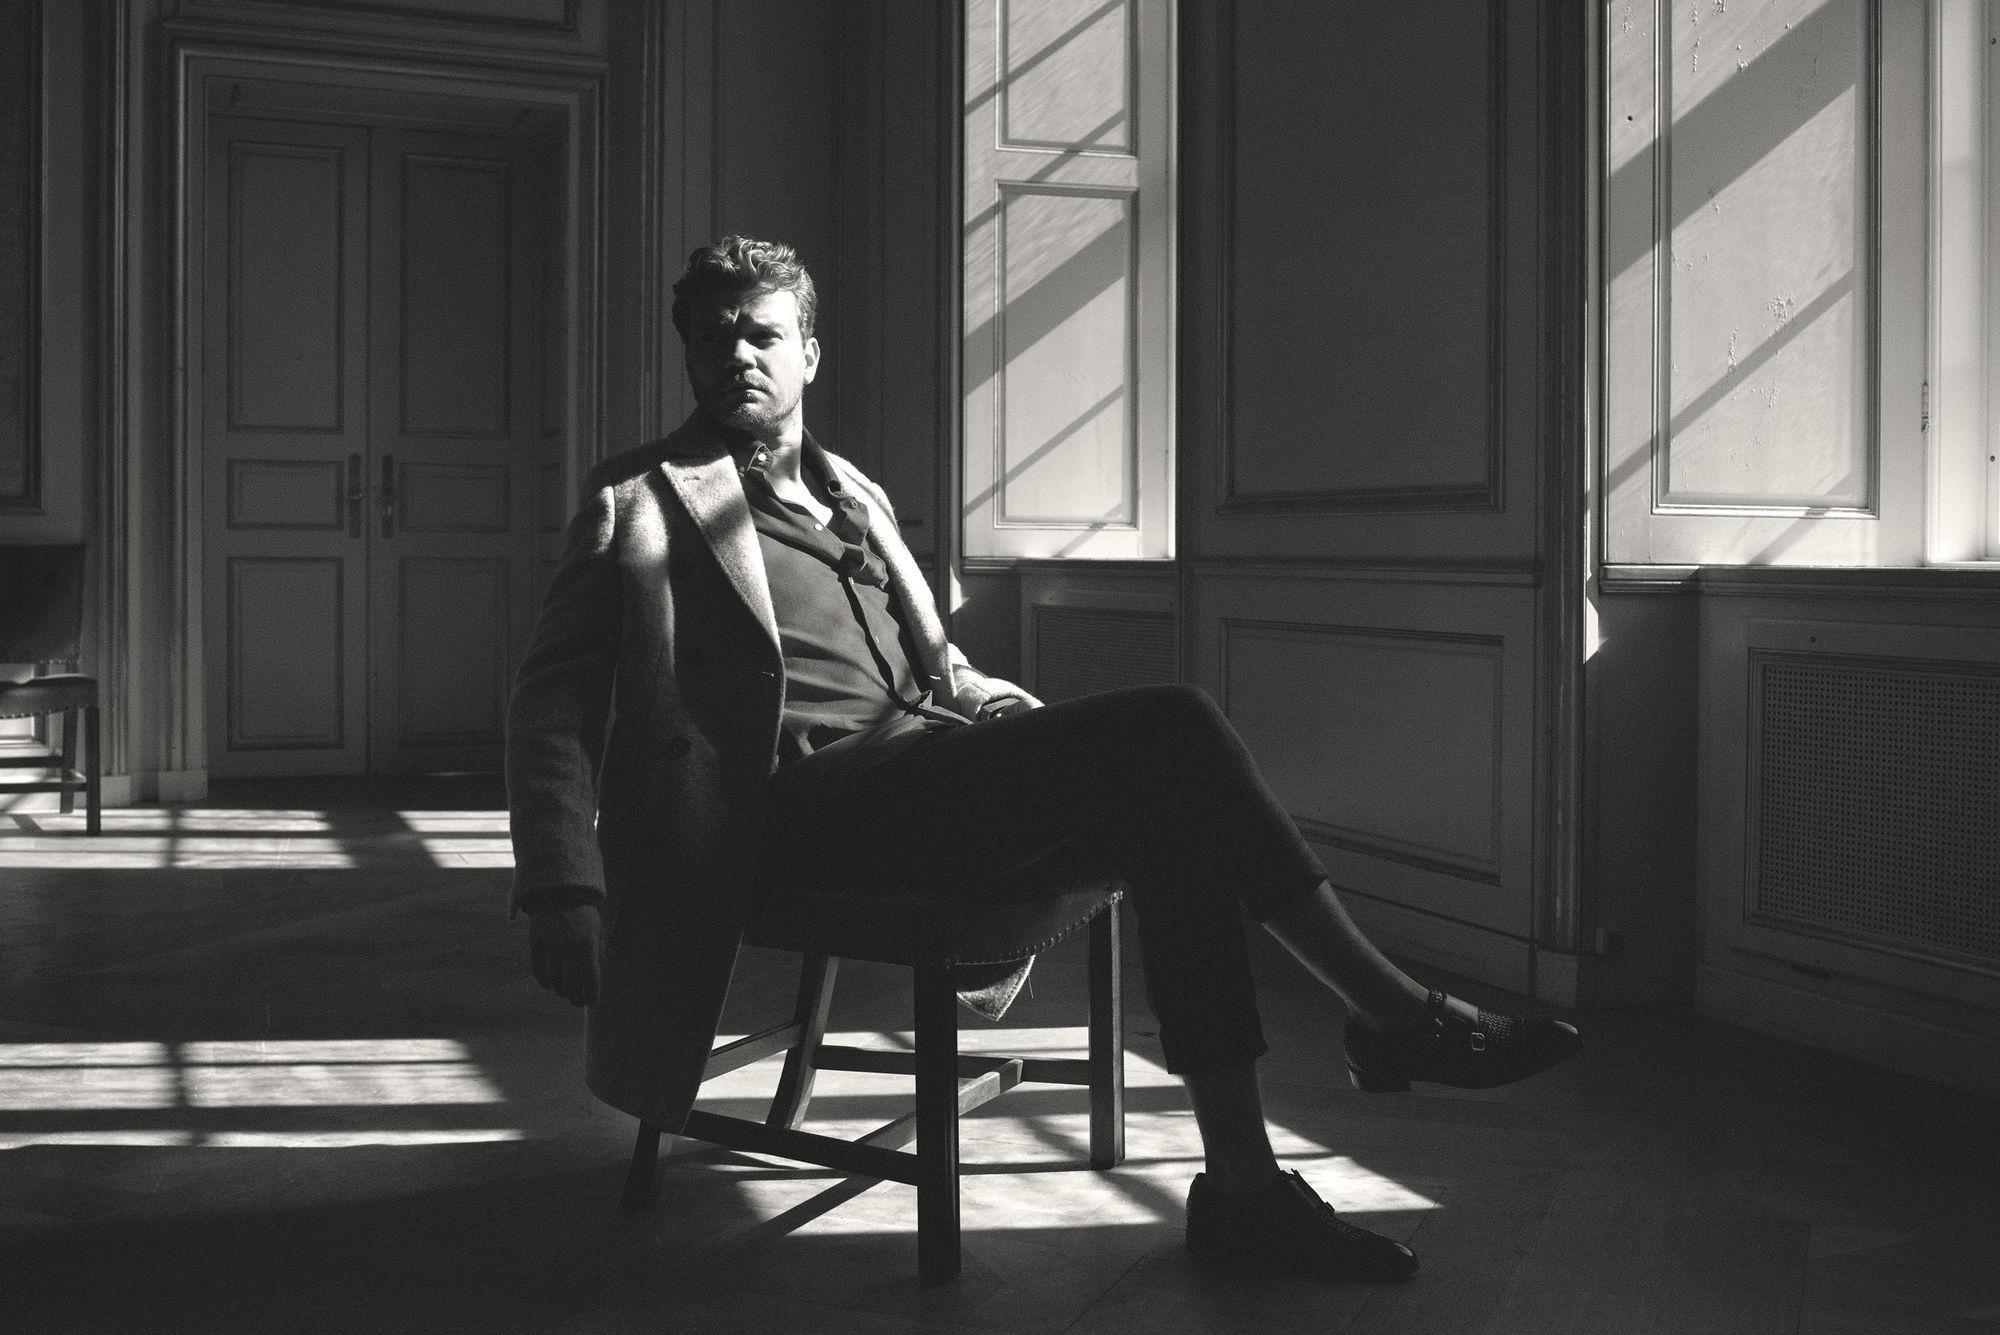 Nikolaj Møller @BLINK PRODUCTION captured actor Pilou Asbæk for the November issue of OUT Magazine